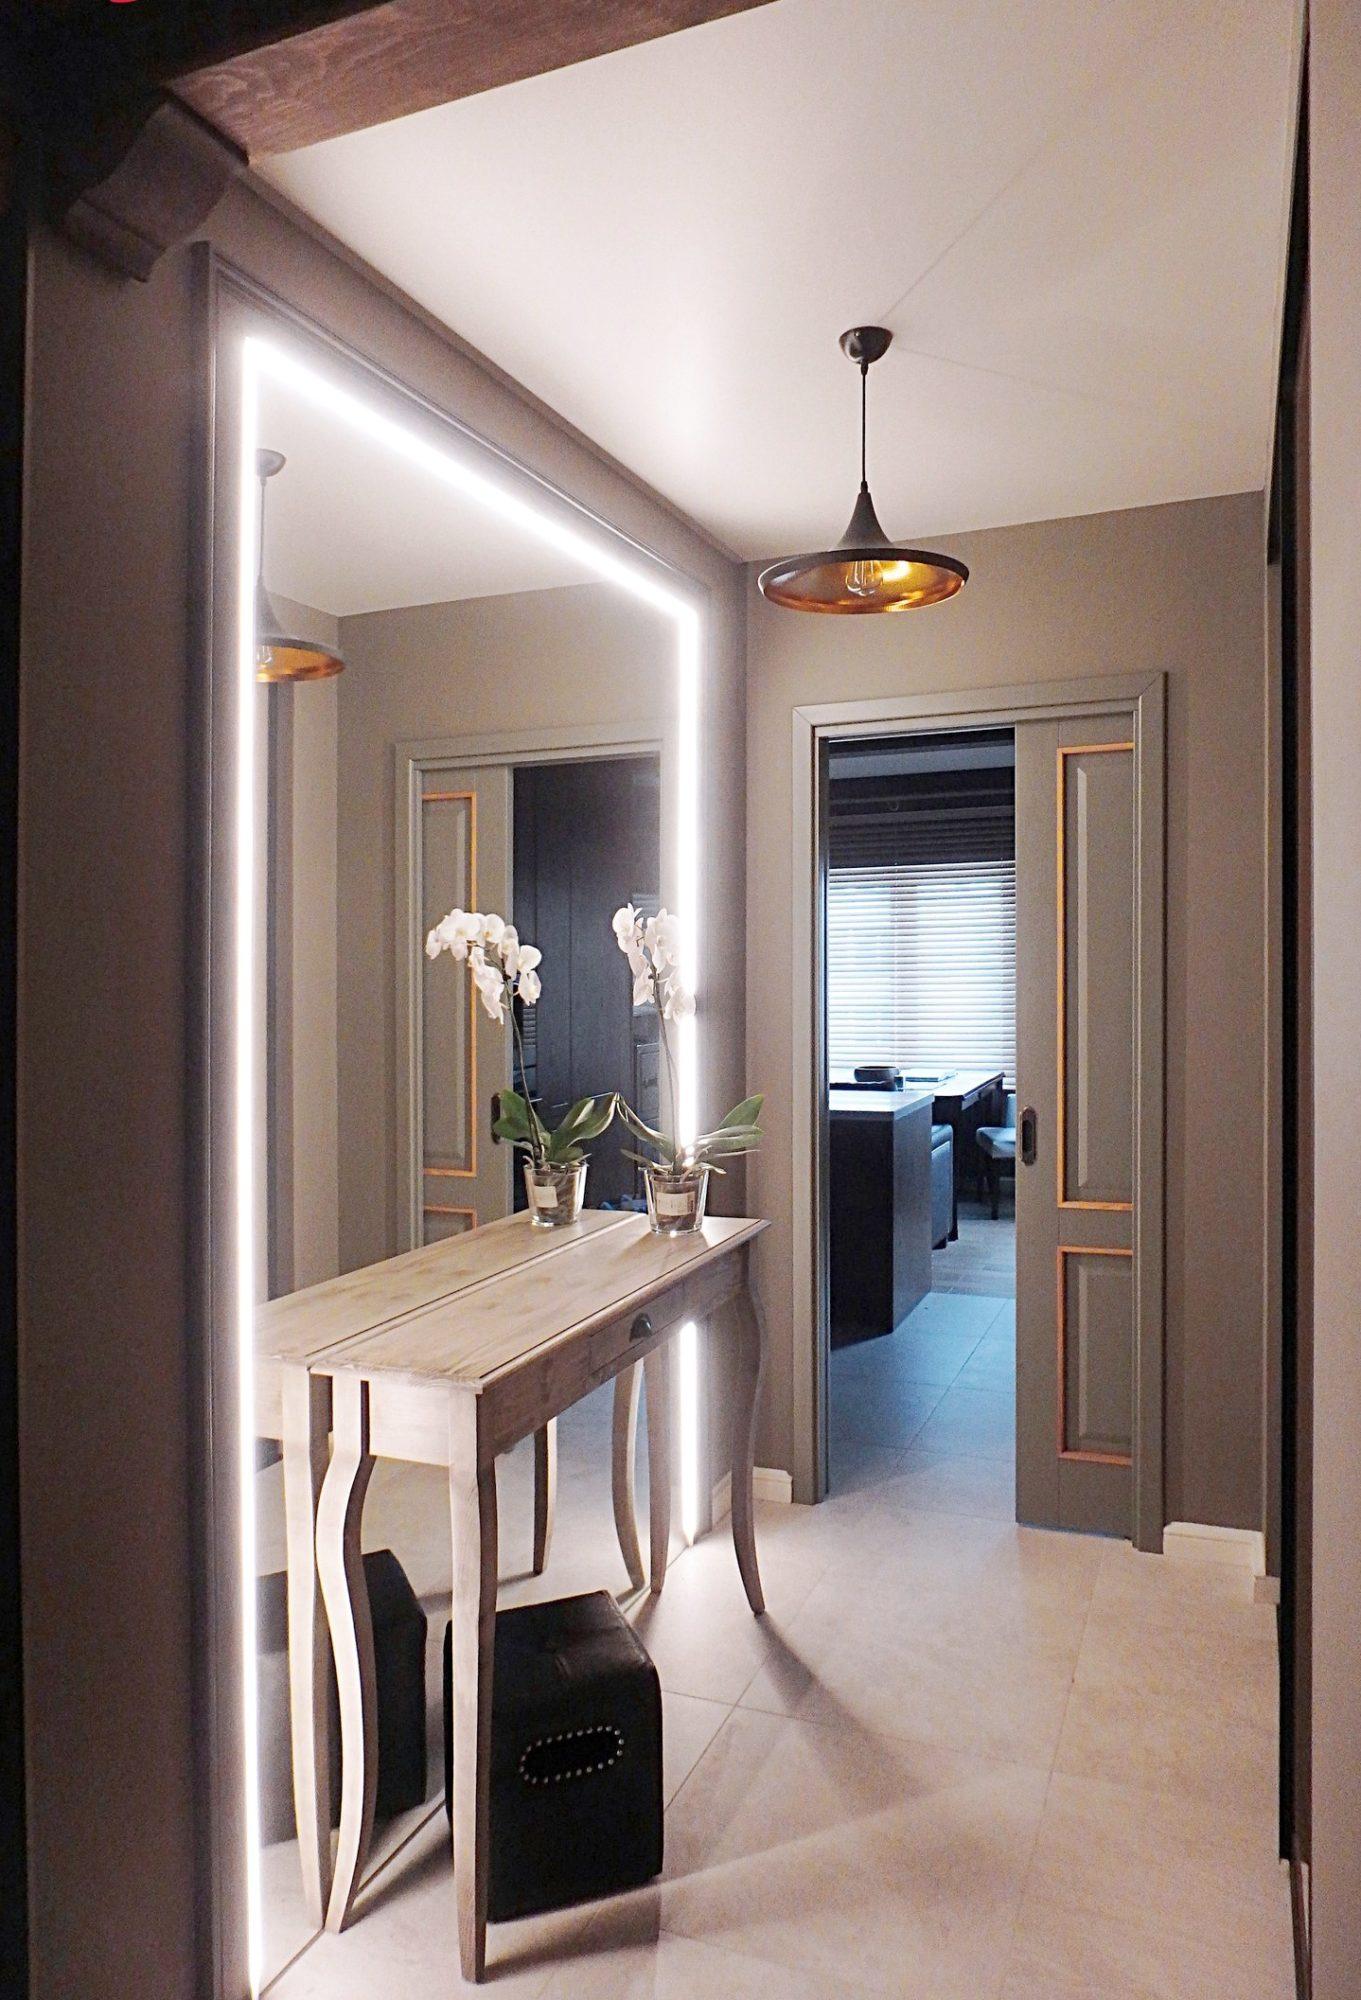 Зеркало в интерьере узкого коридора